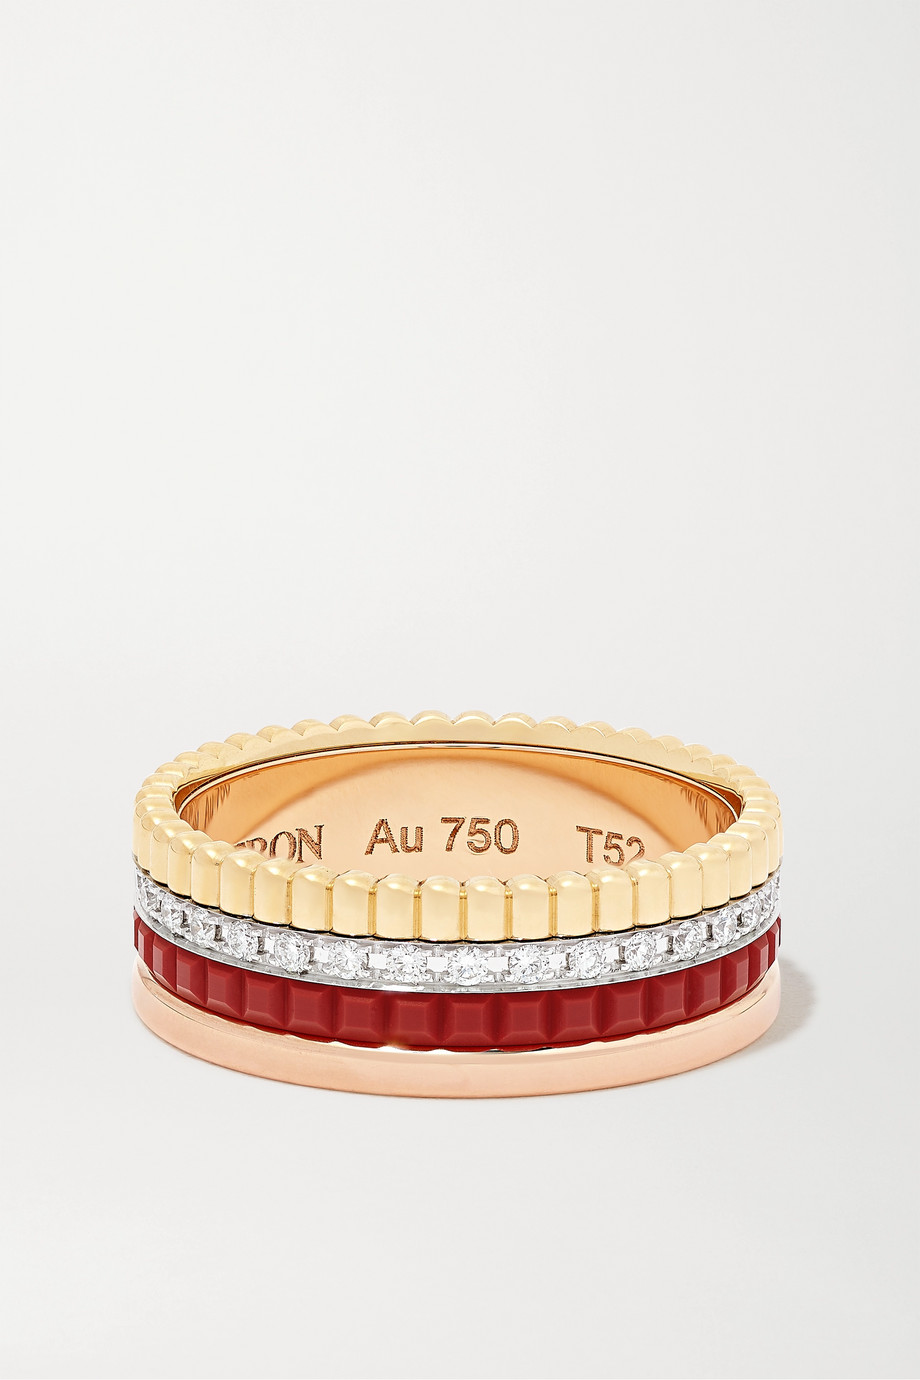 Boucheron Quatre Red Edition Small 18-karat yellow, white and rose gold, ceramic and diamond ring